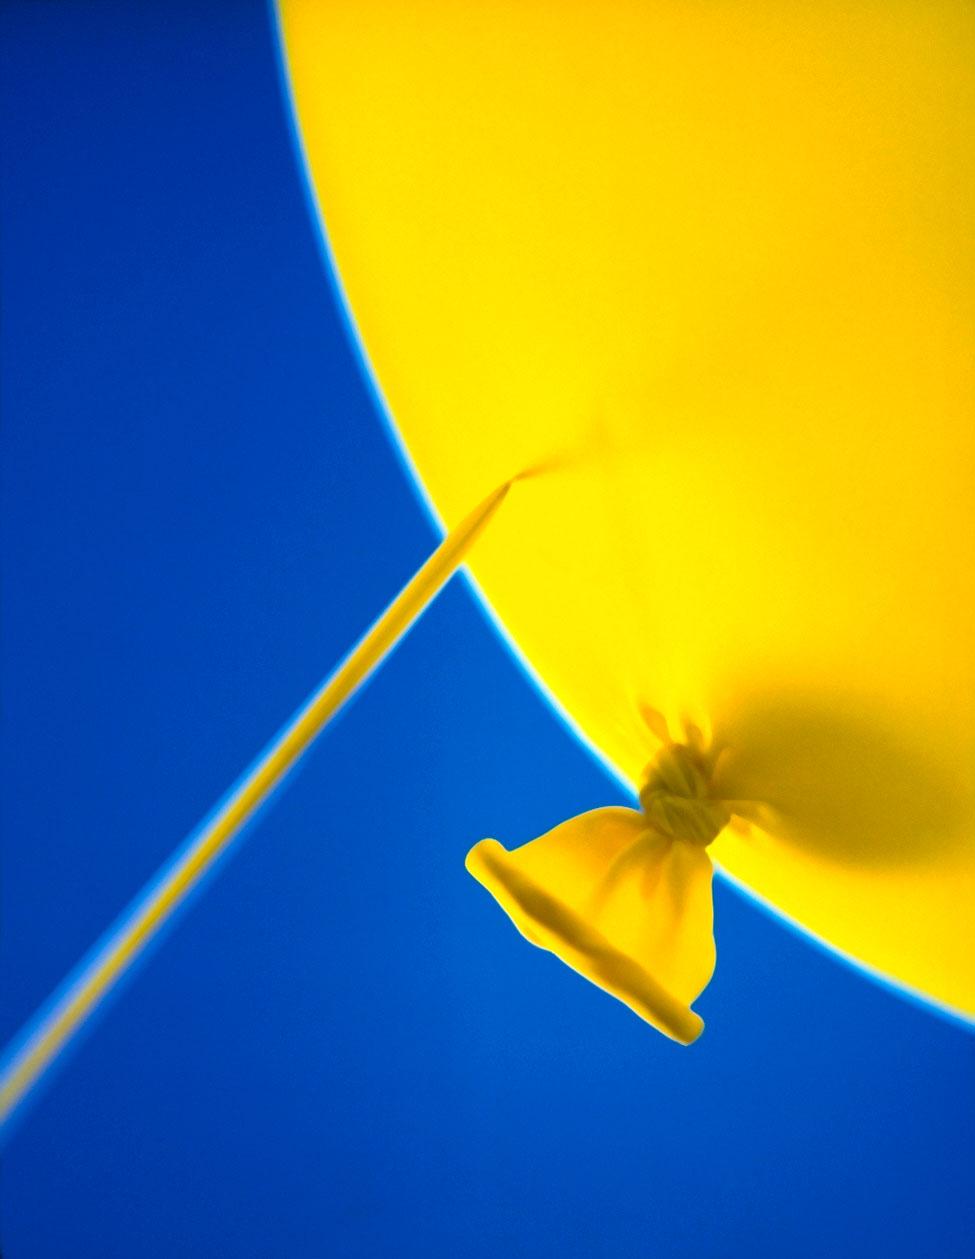 Rick Davis Photographic, Philadelphia, Still Life, Photography, Still Life Photography, Balloon, Pop, Needle